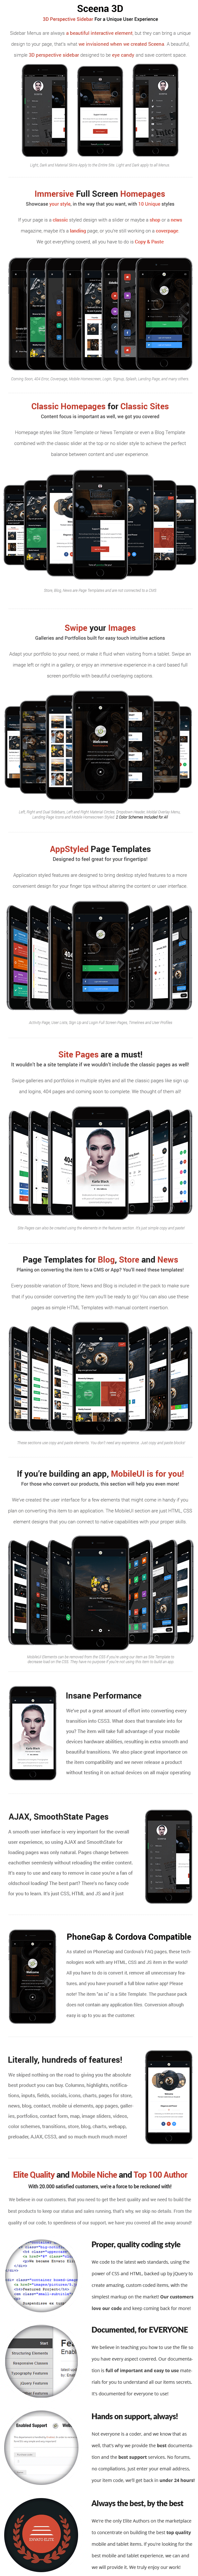 Sceena 3D | PhoneGap & Cordova Mobile App - 10